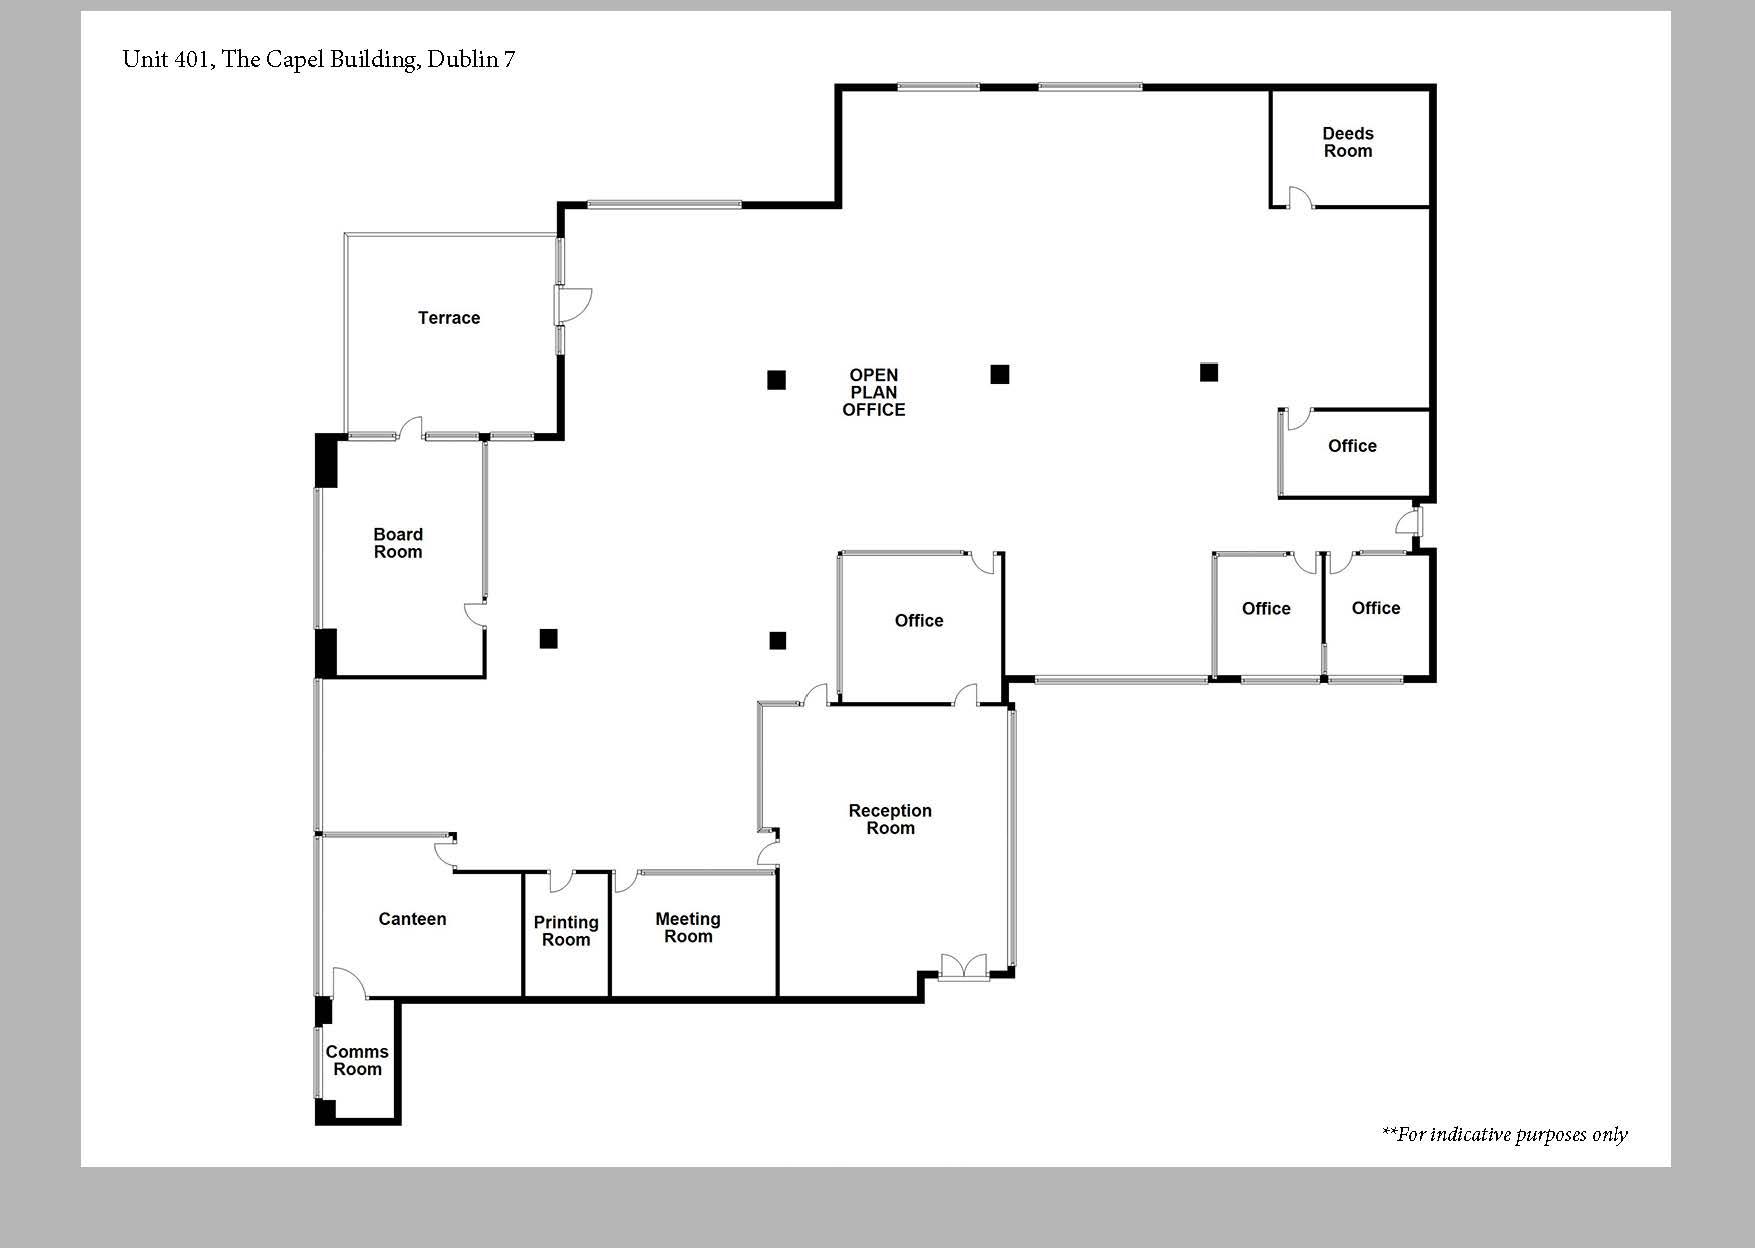 Capel Building Floor Plan